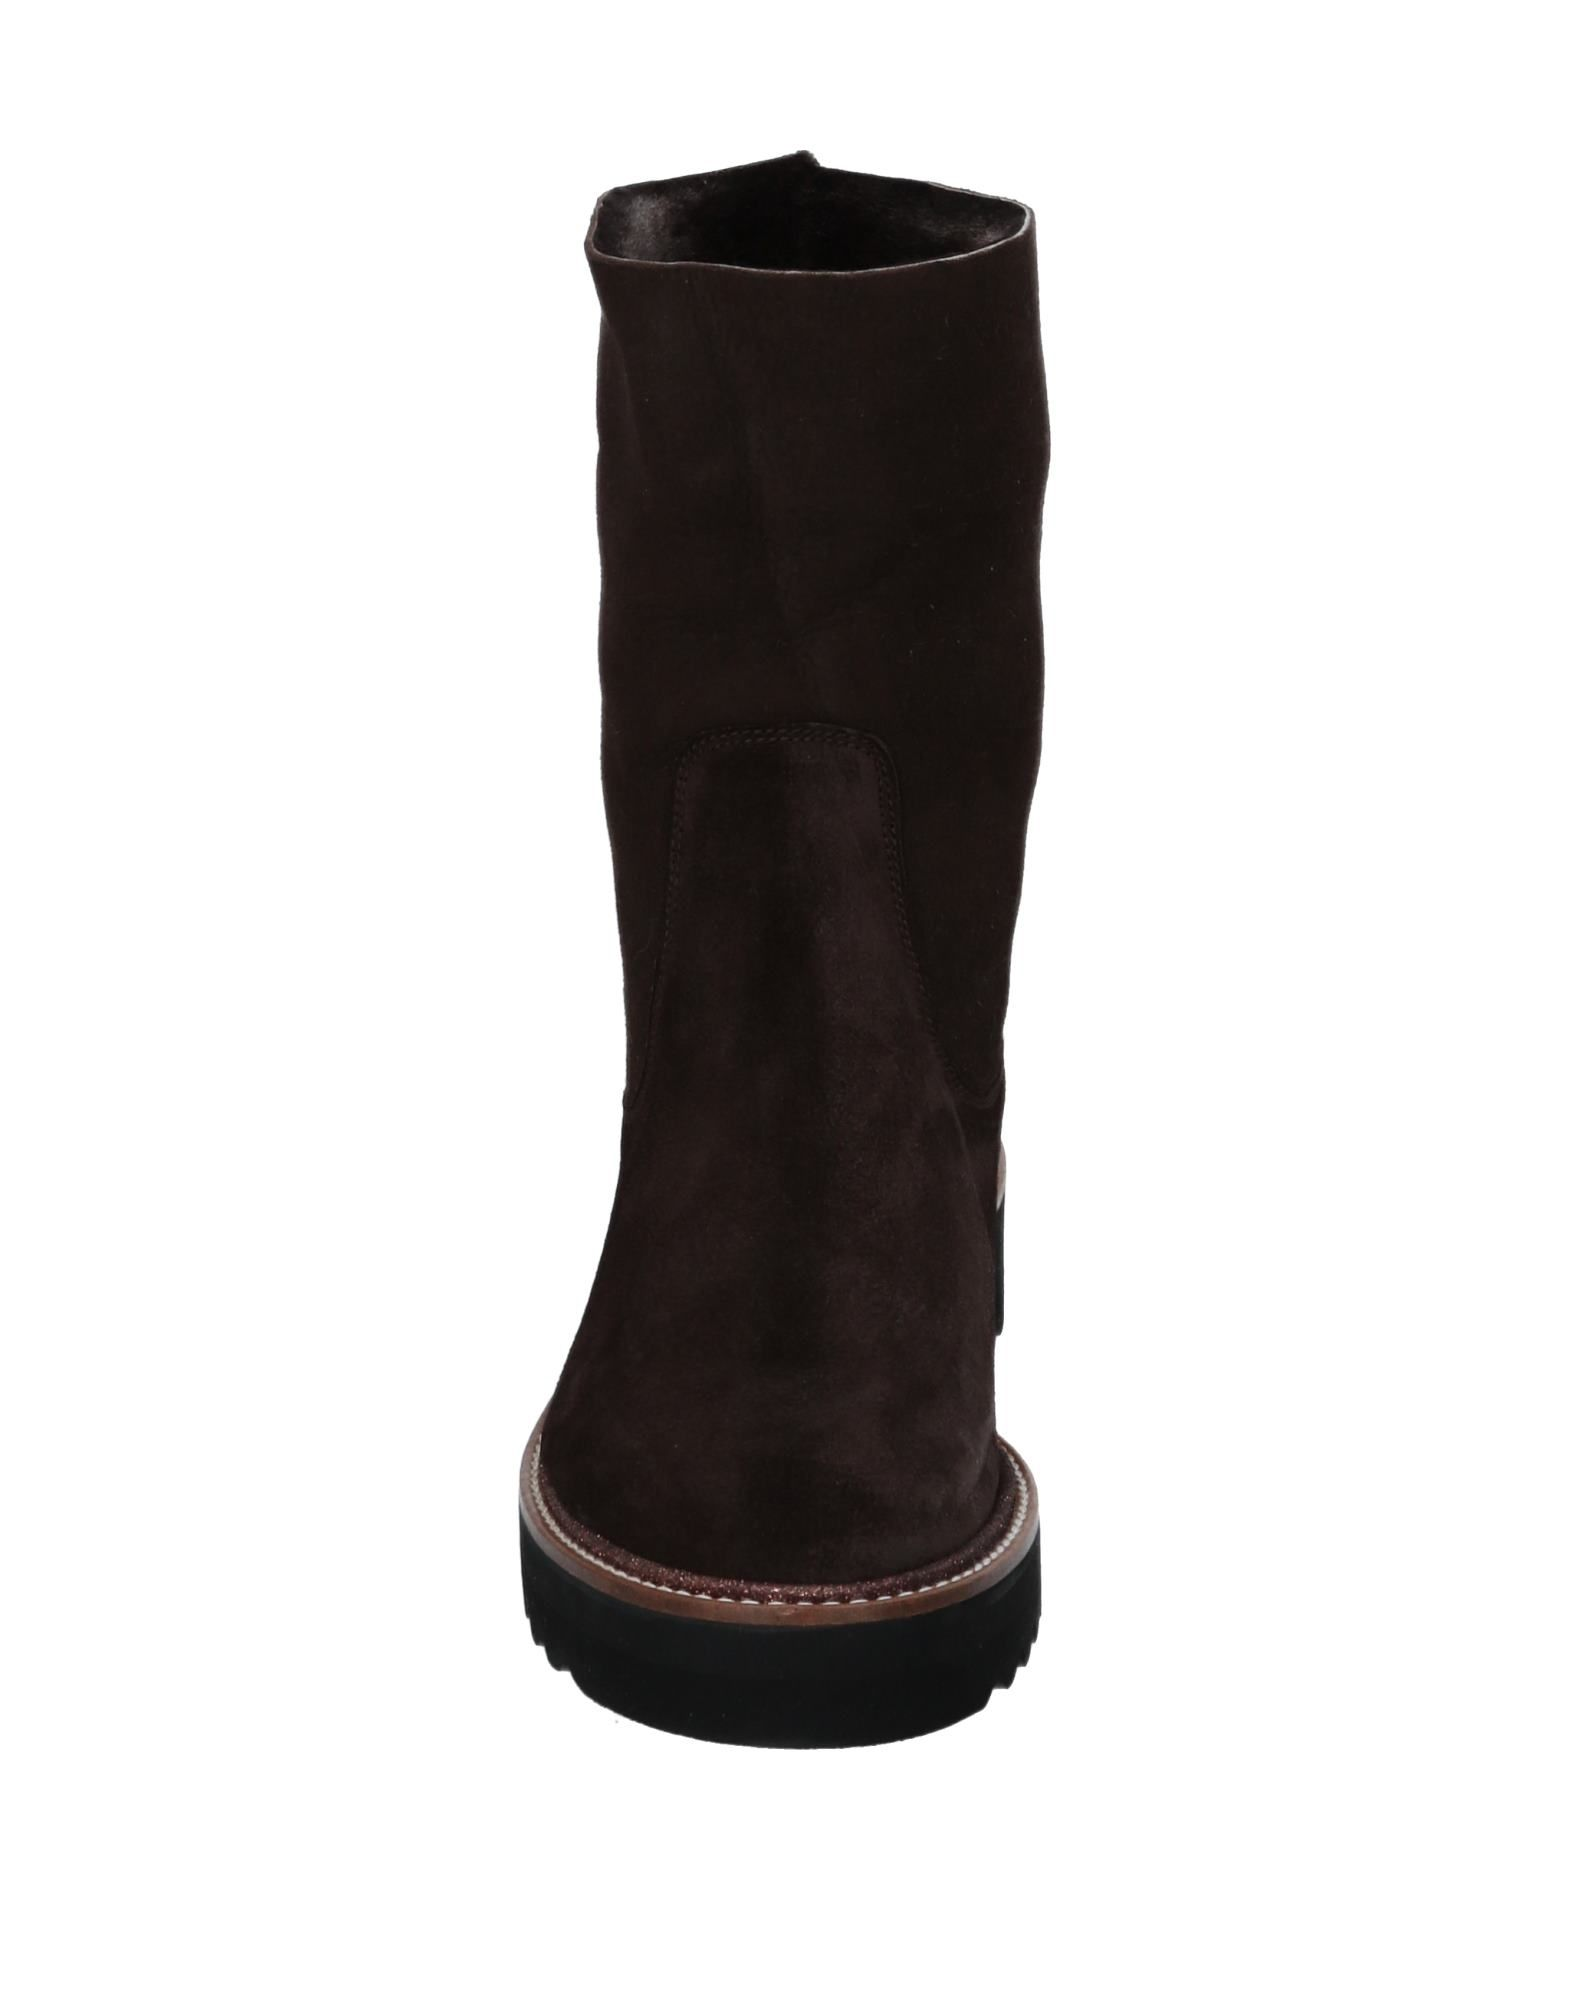 Stilvolle billige  Schuhe Pertini Stiefelette Damen  billige 11535194FW 45a09e